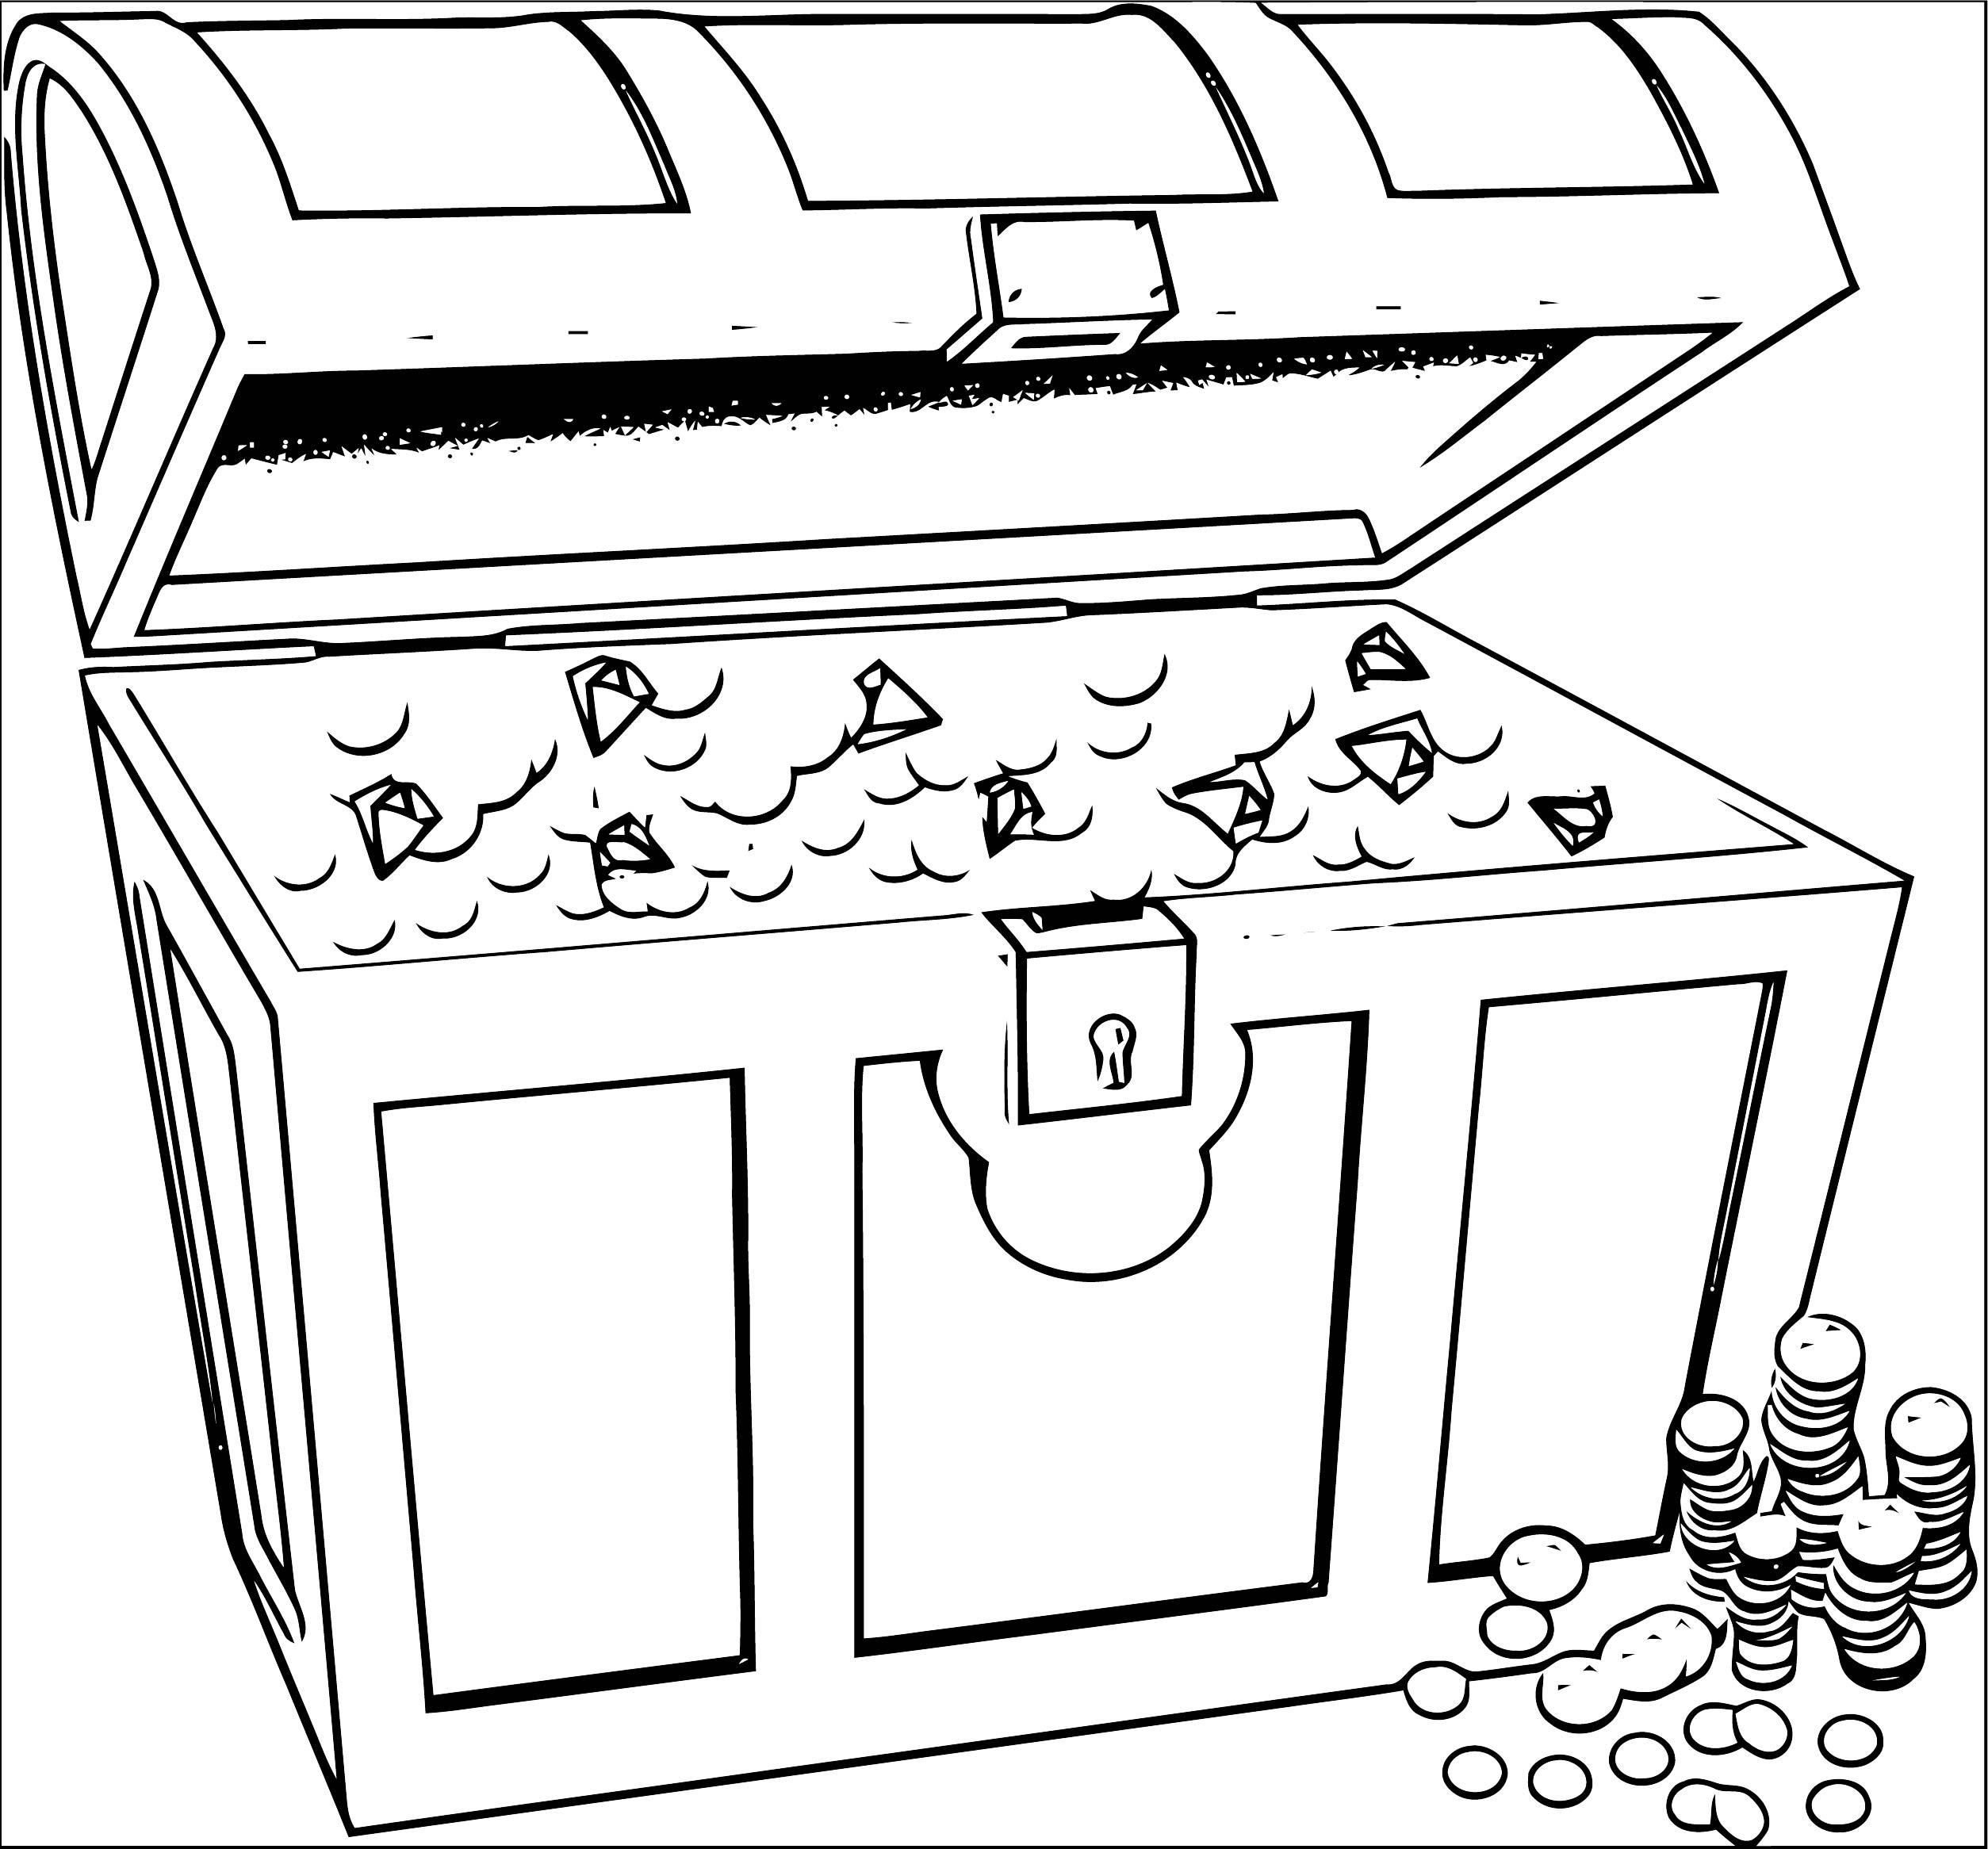 Treasurchest Money Coloring Page